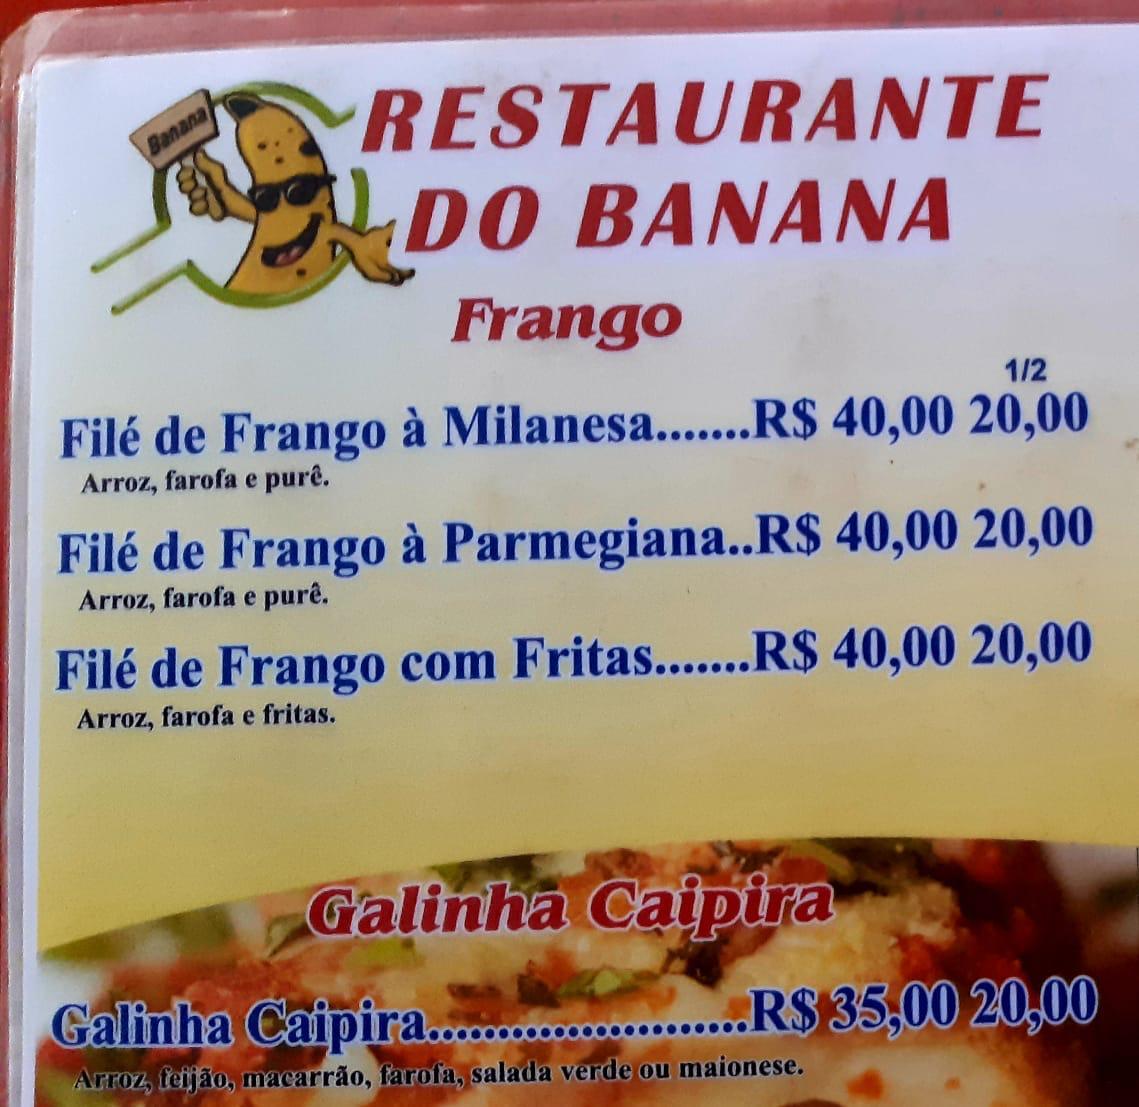 Restaurante do banana